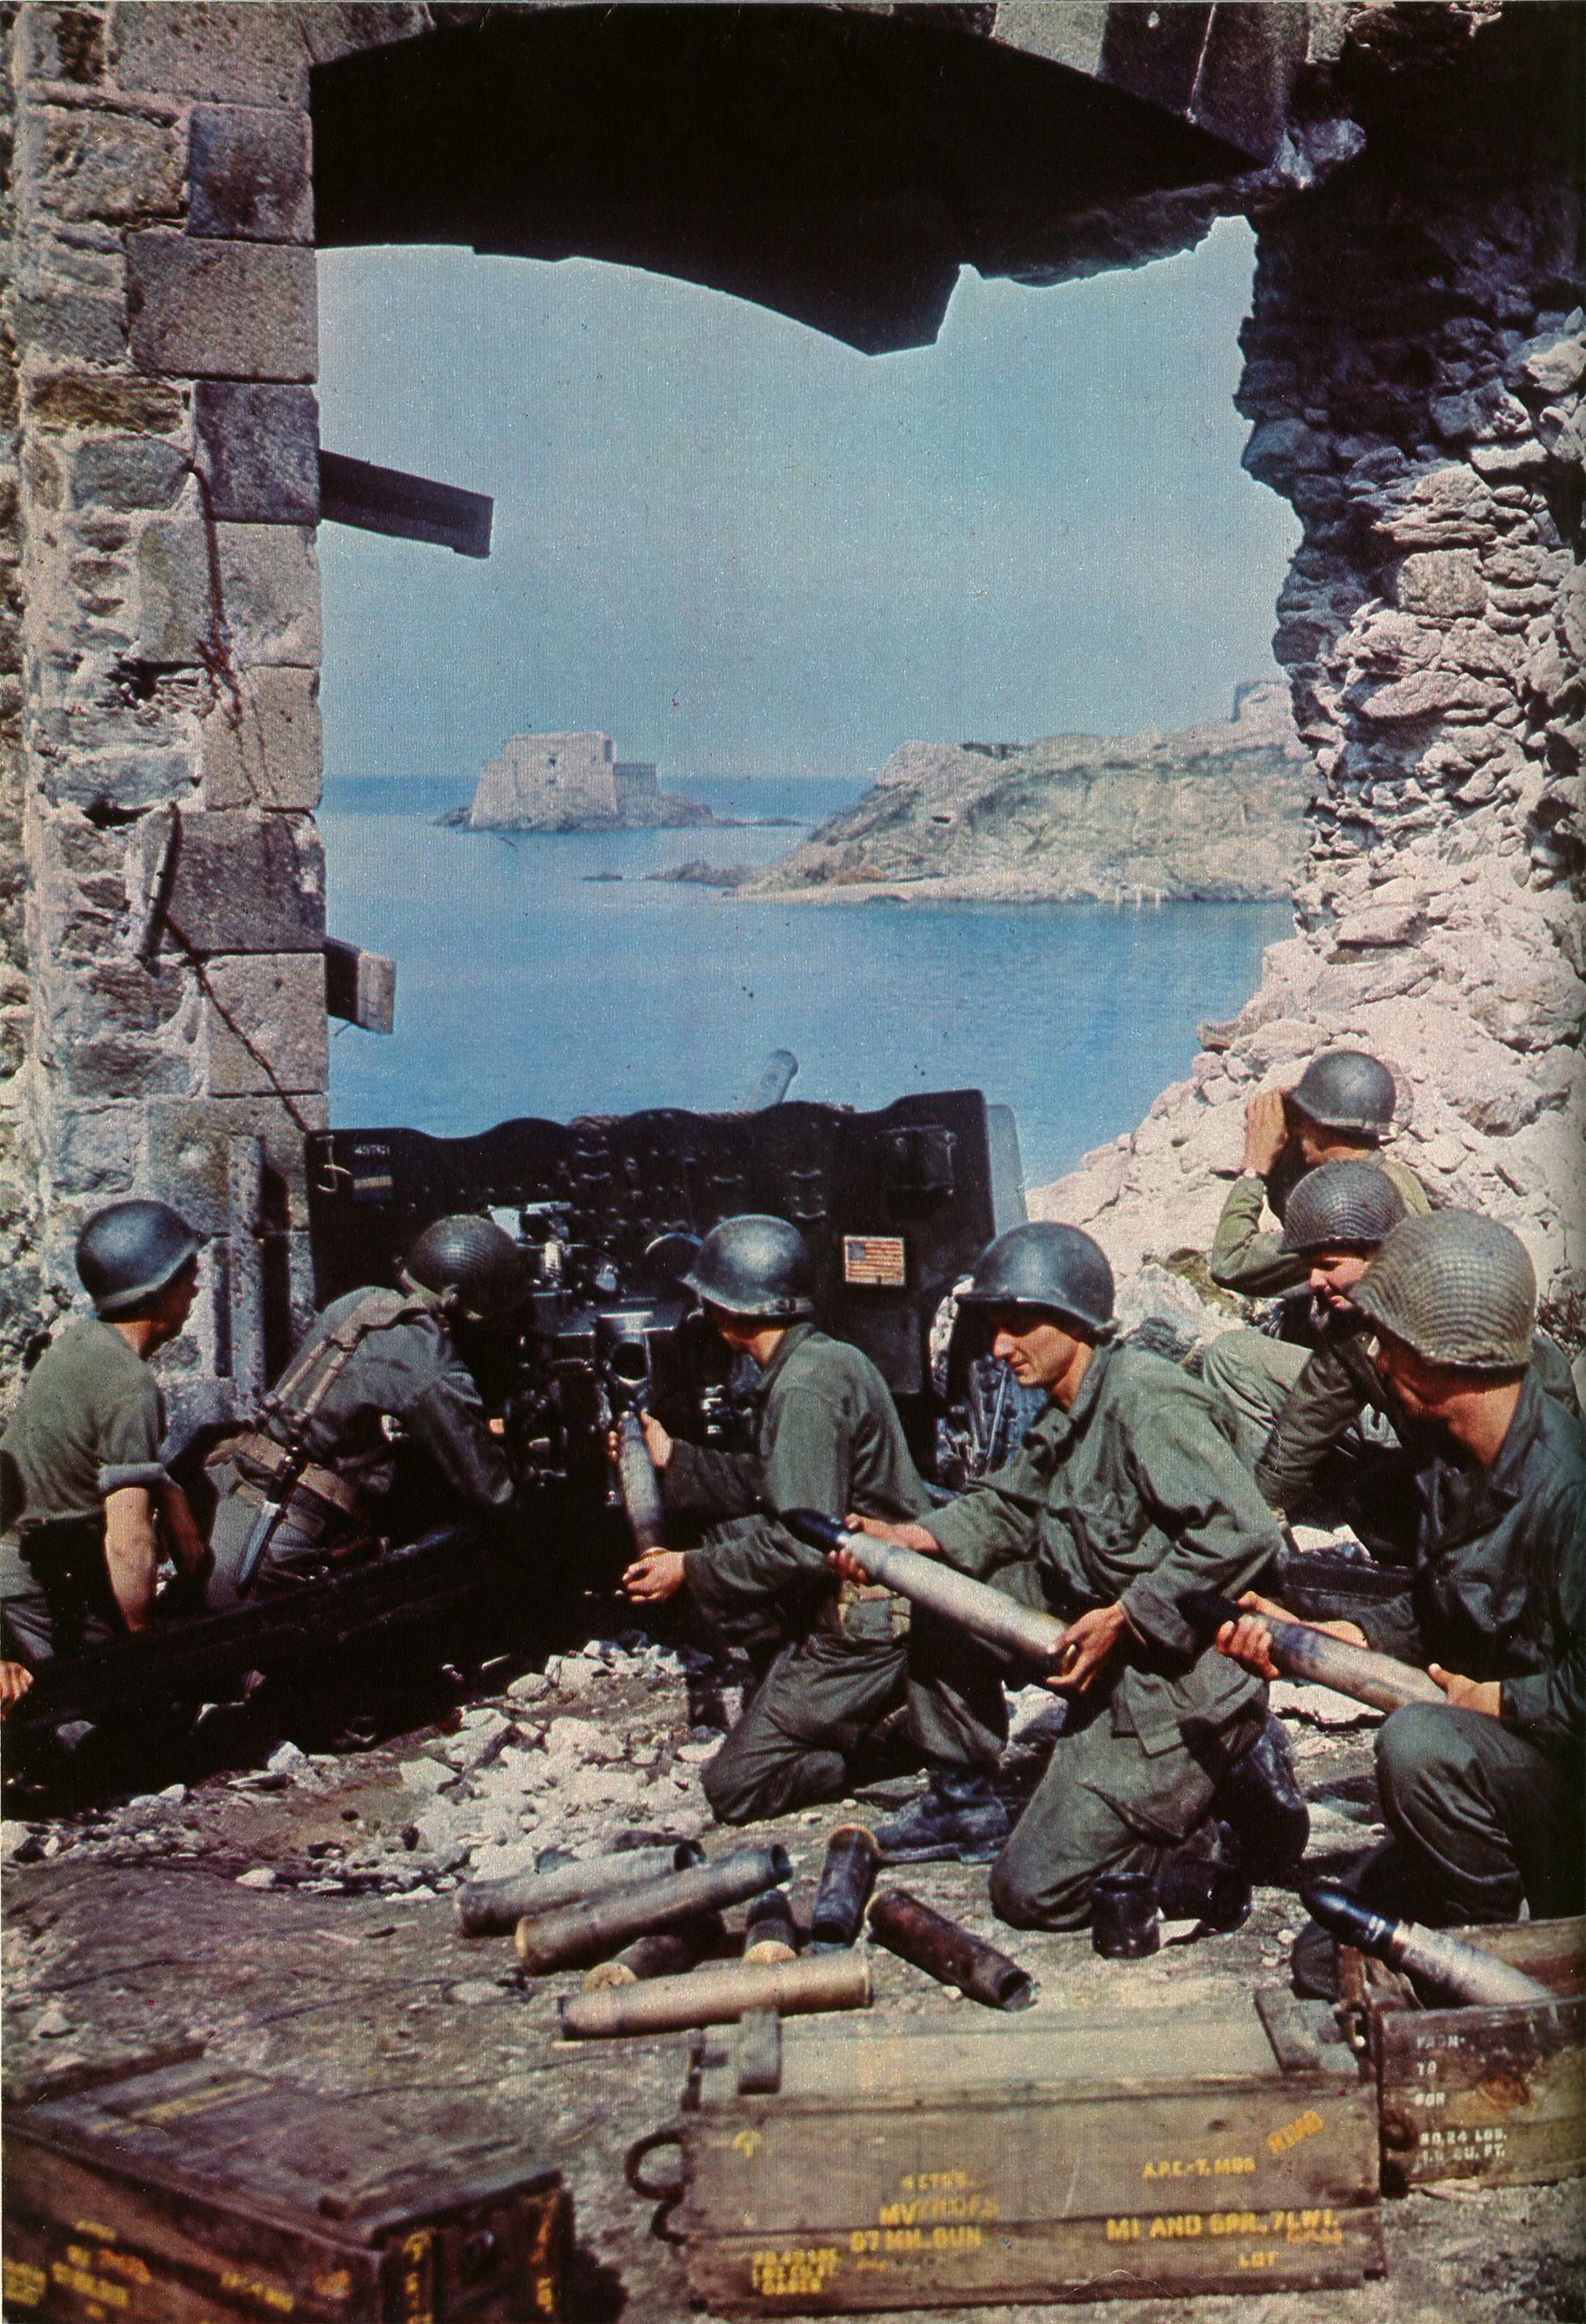 57mm_Gun_M1_-_Saint-Malon_Bretagne.jpg